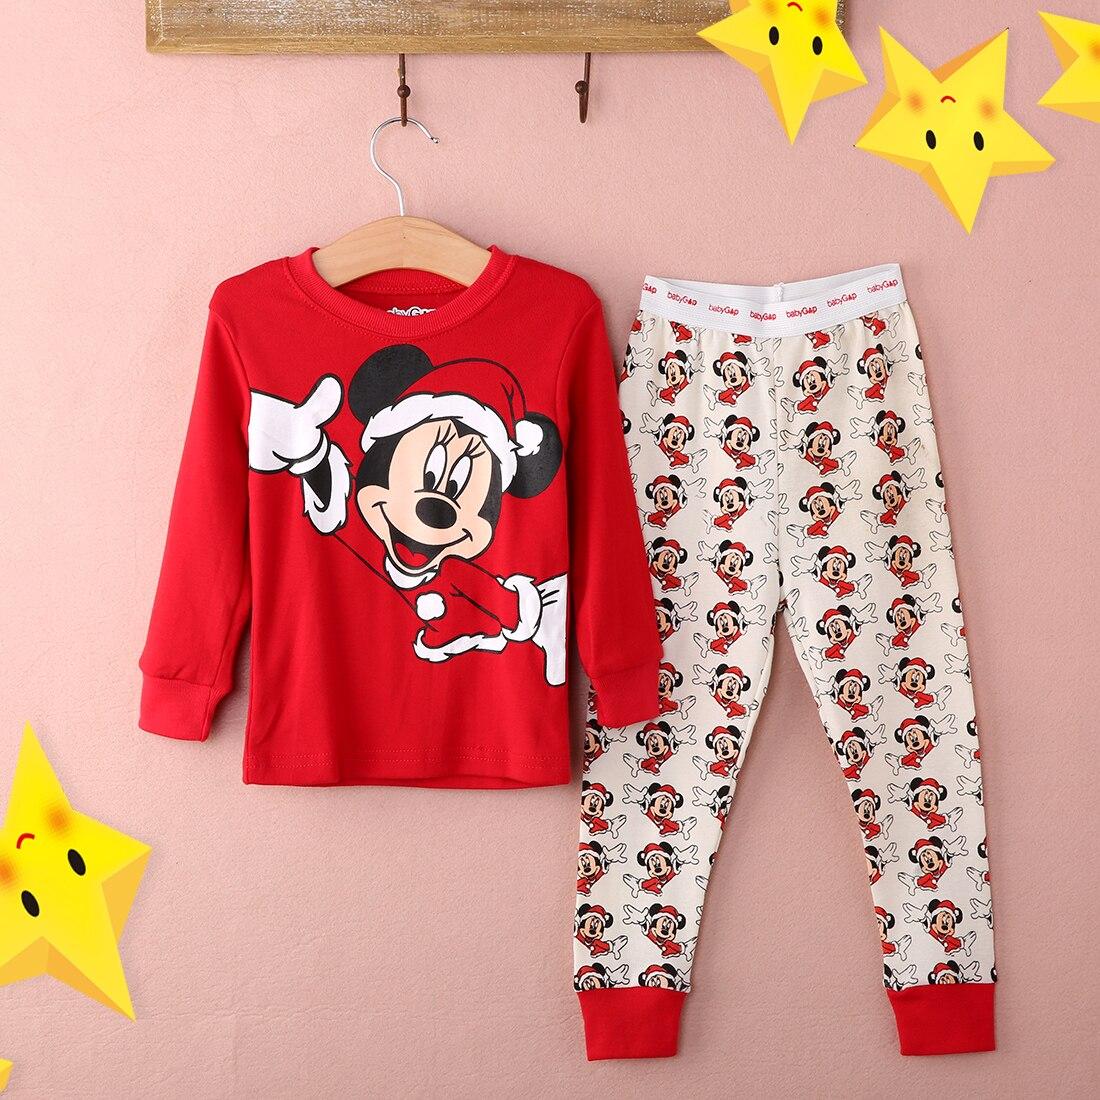 Online Get Cheap Girls Sleepwear Sale -Aliexpress.com | Alibaba Group